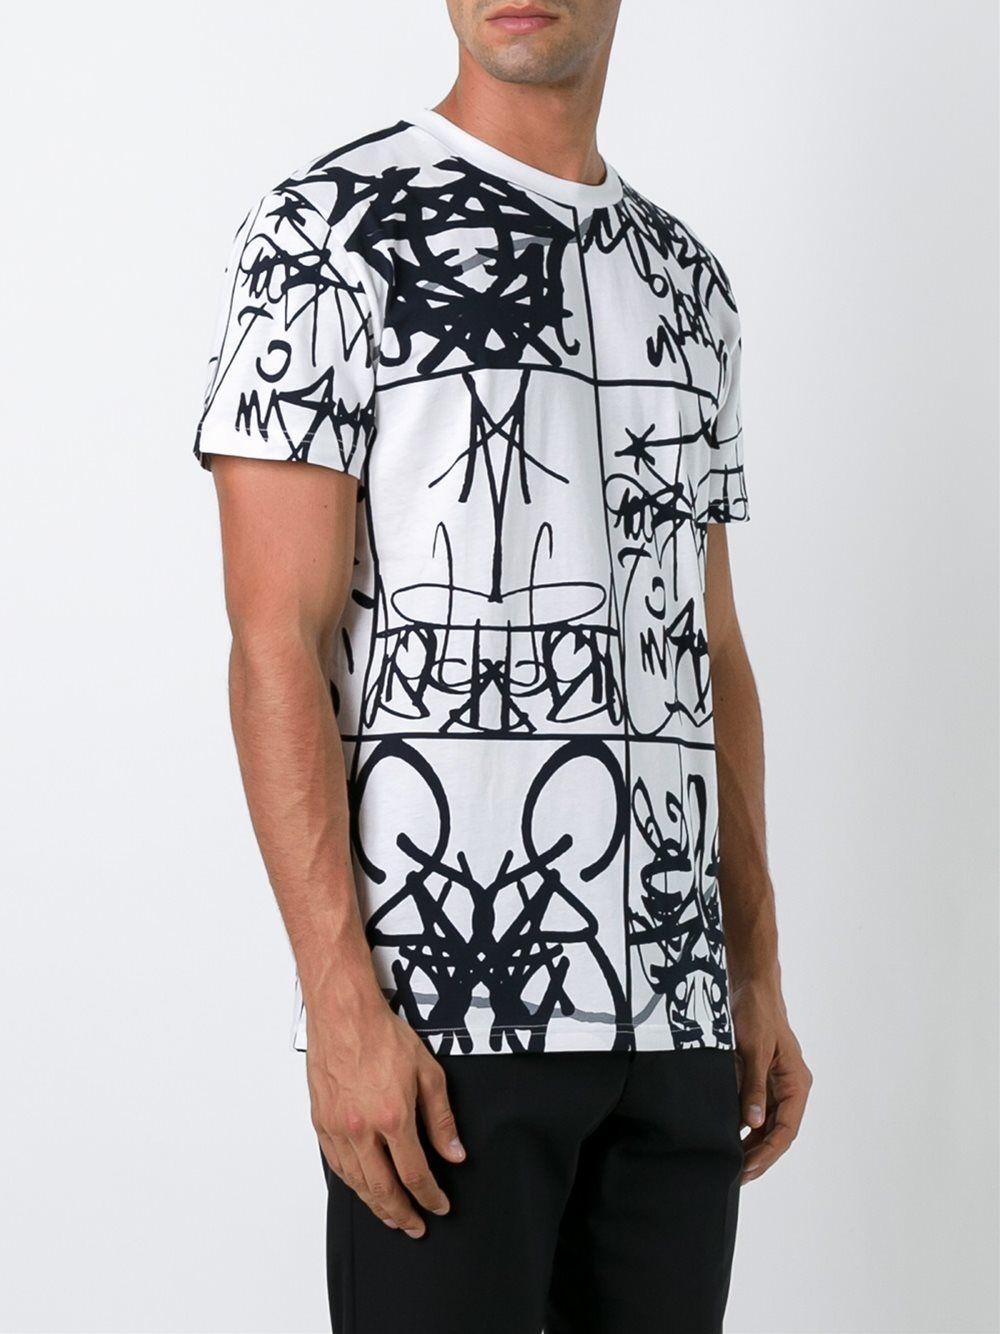 Moschino Camiseta Con Estampado De Graffiti